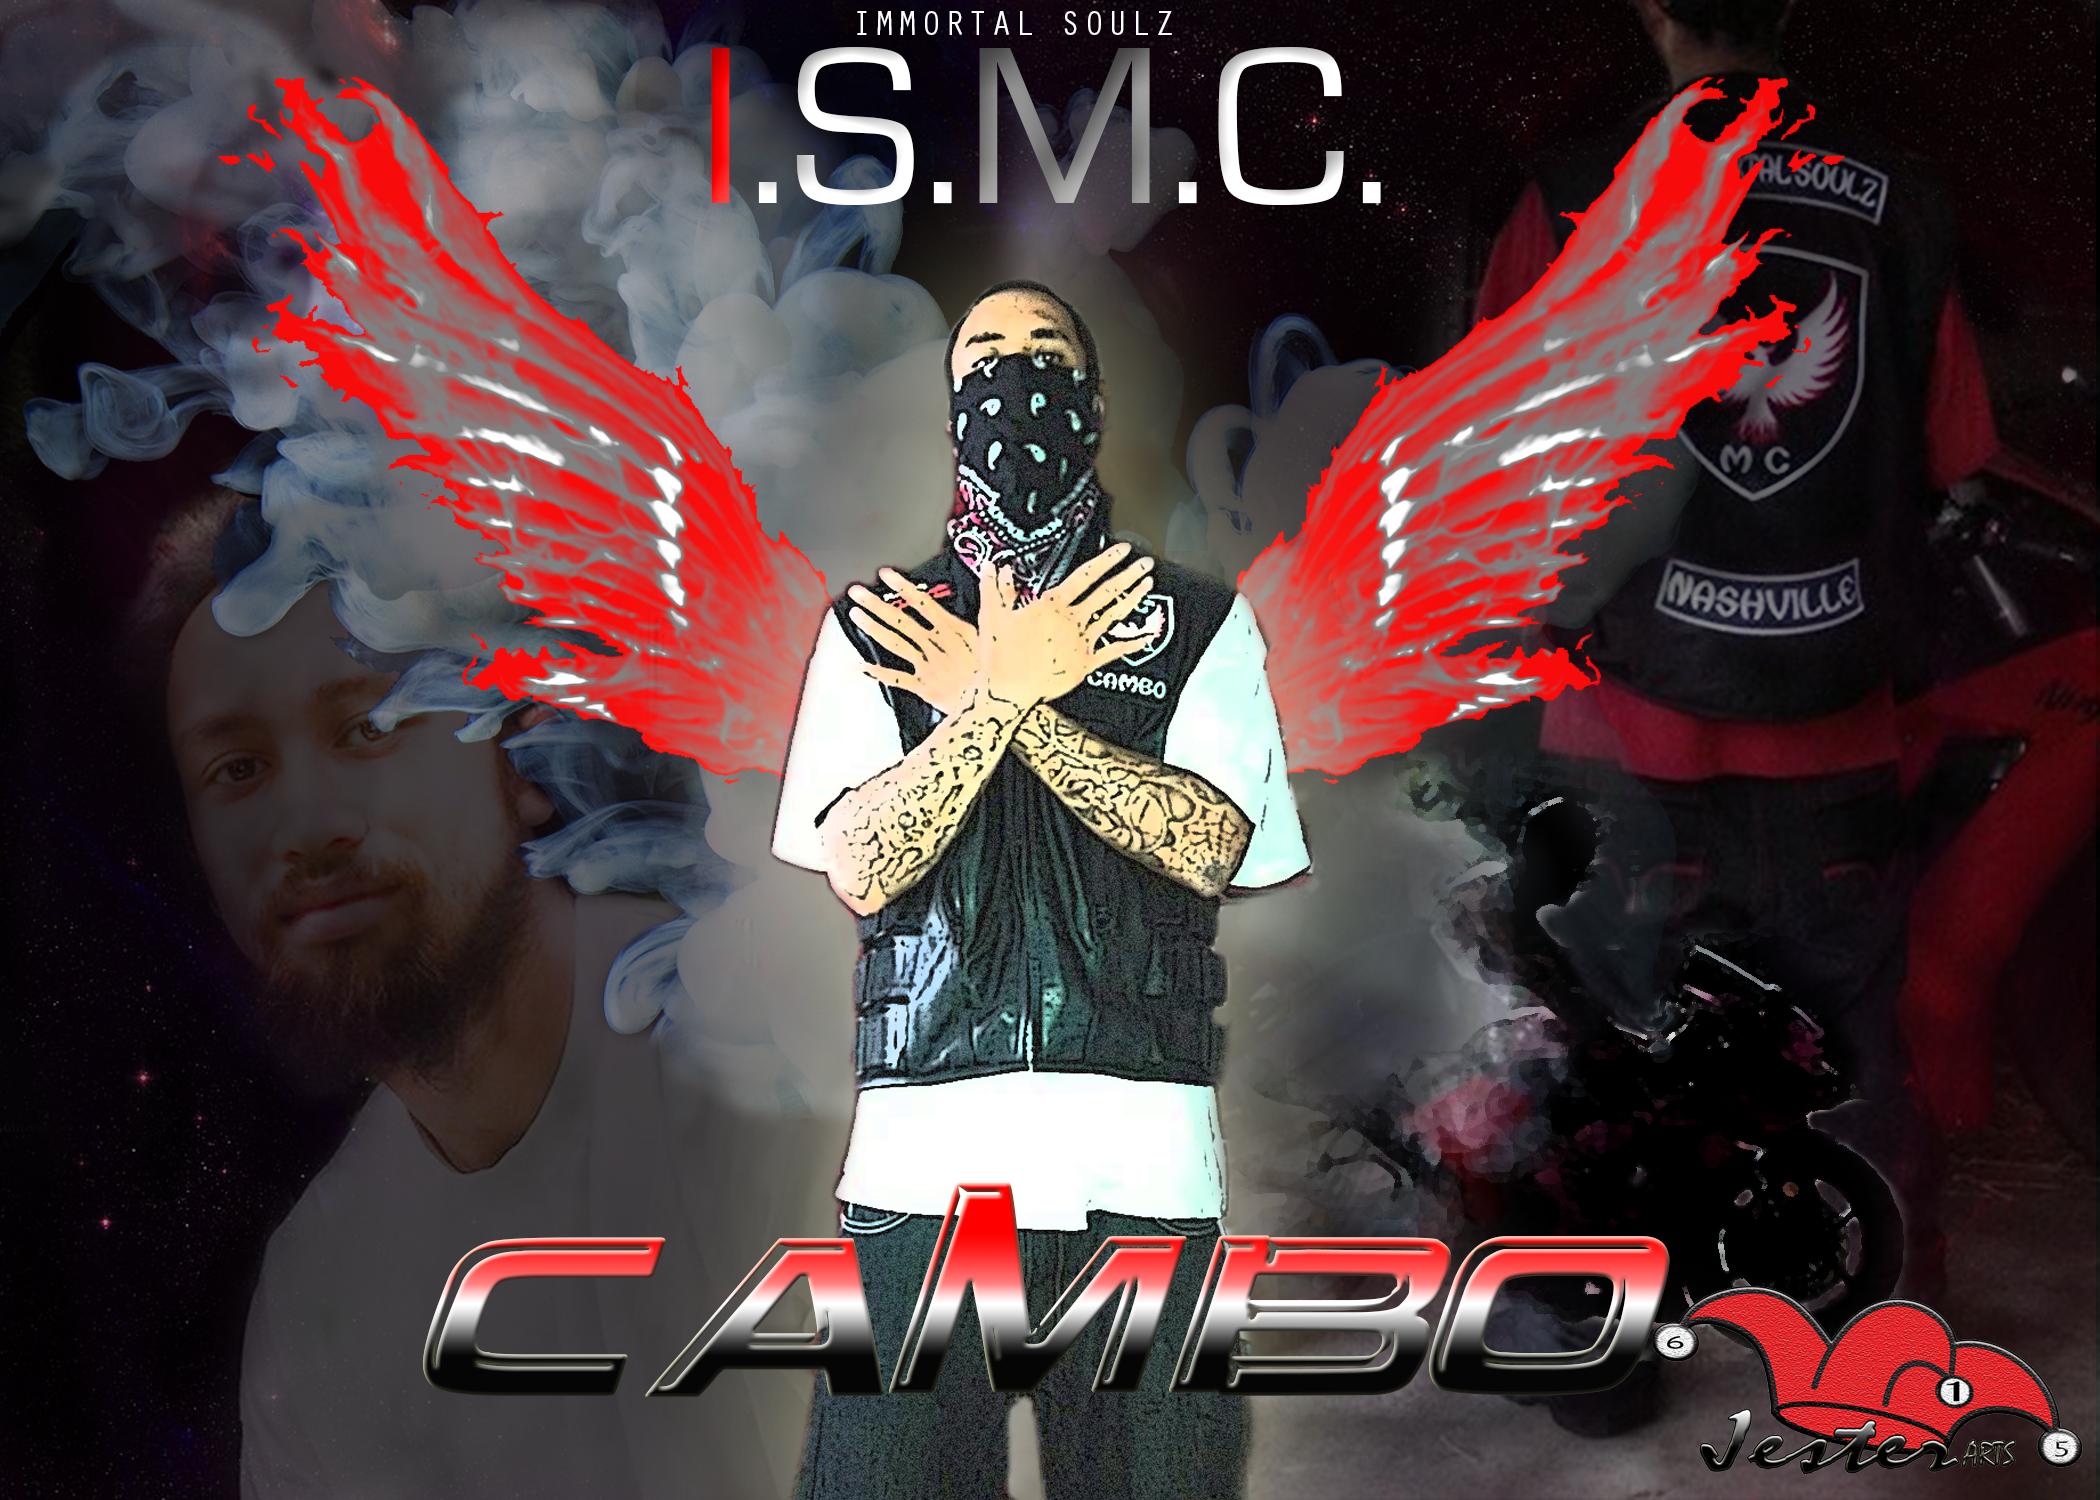 Cambo of I.S.M.C.